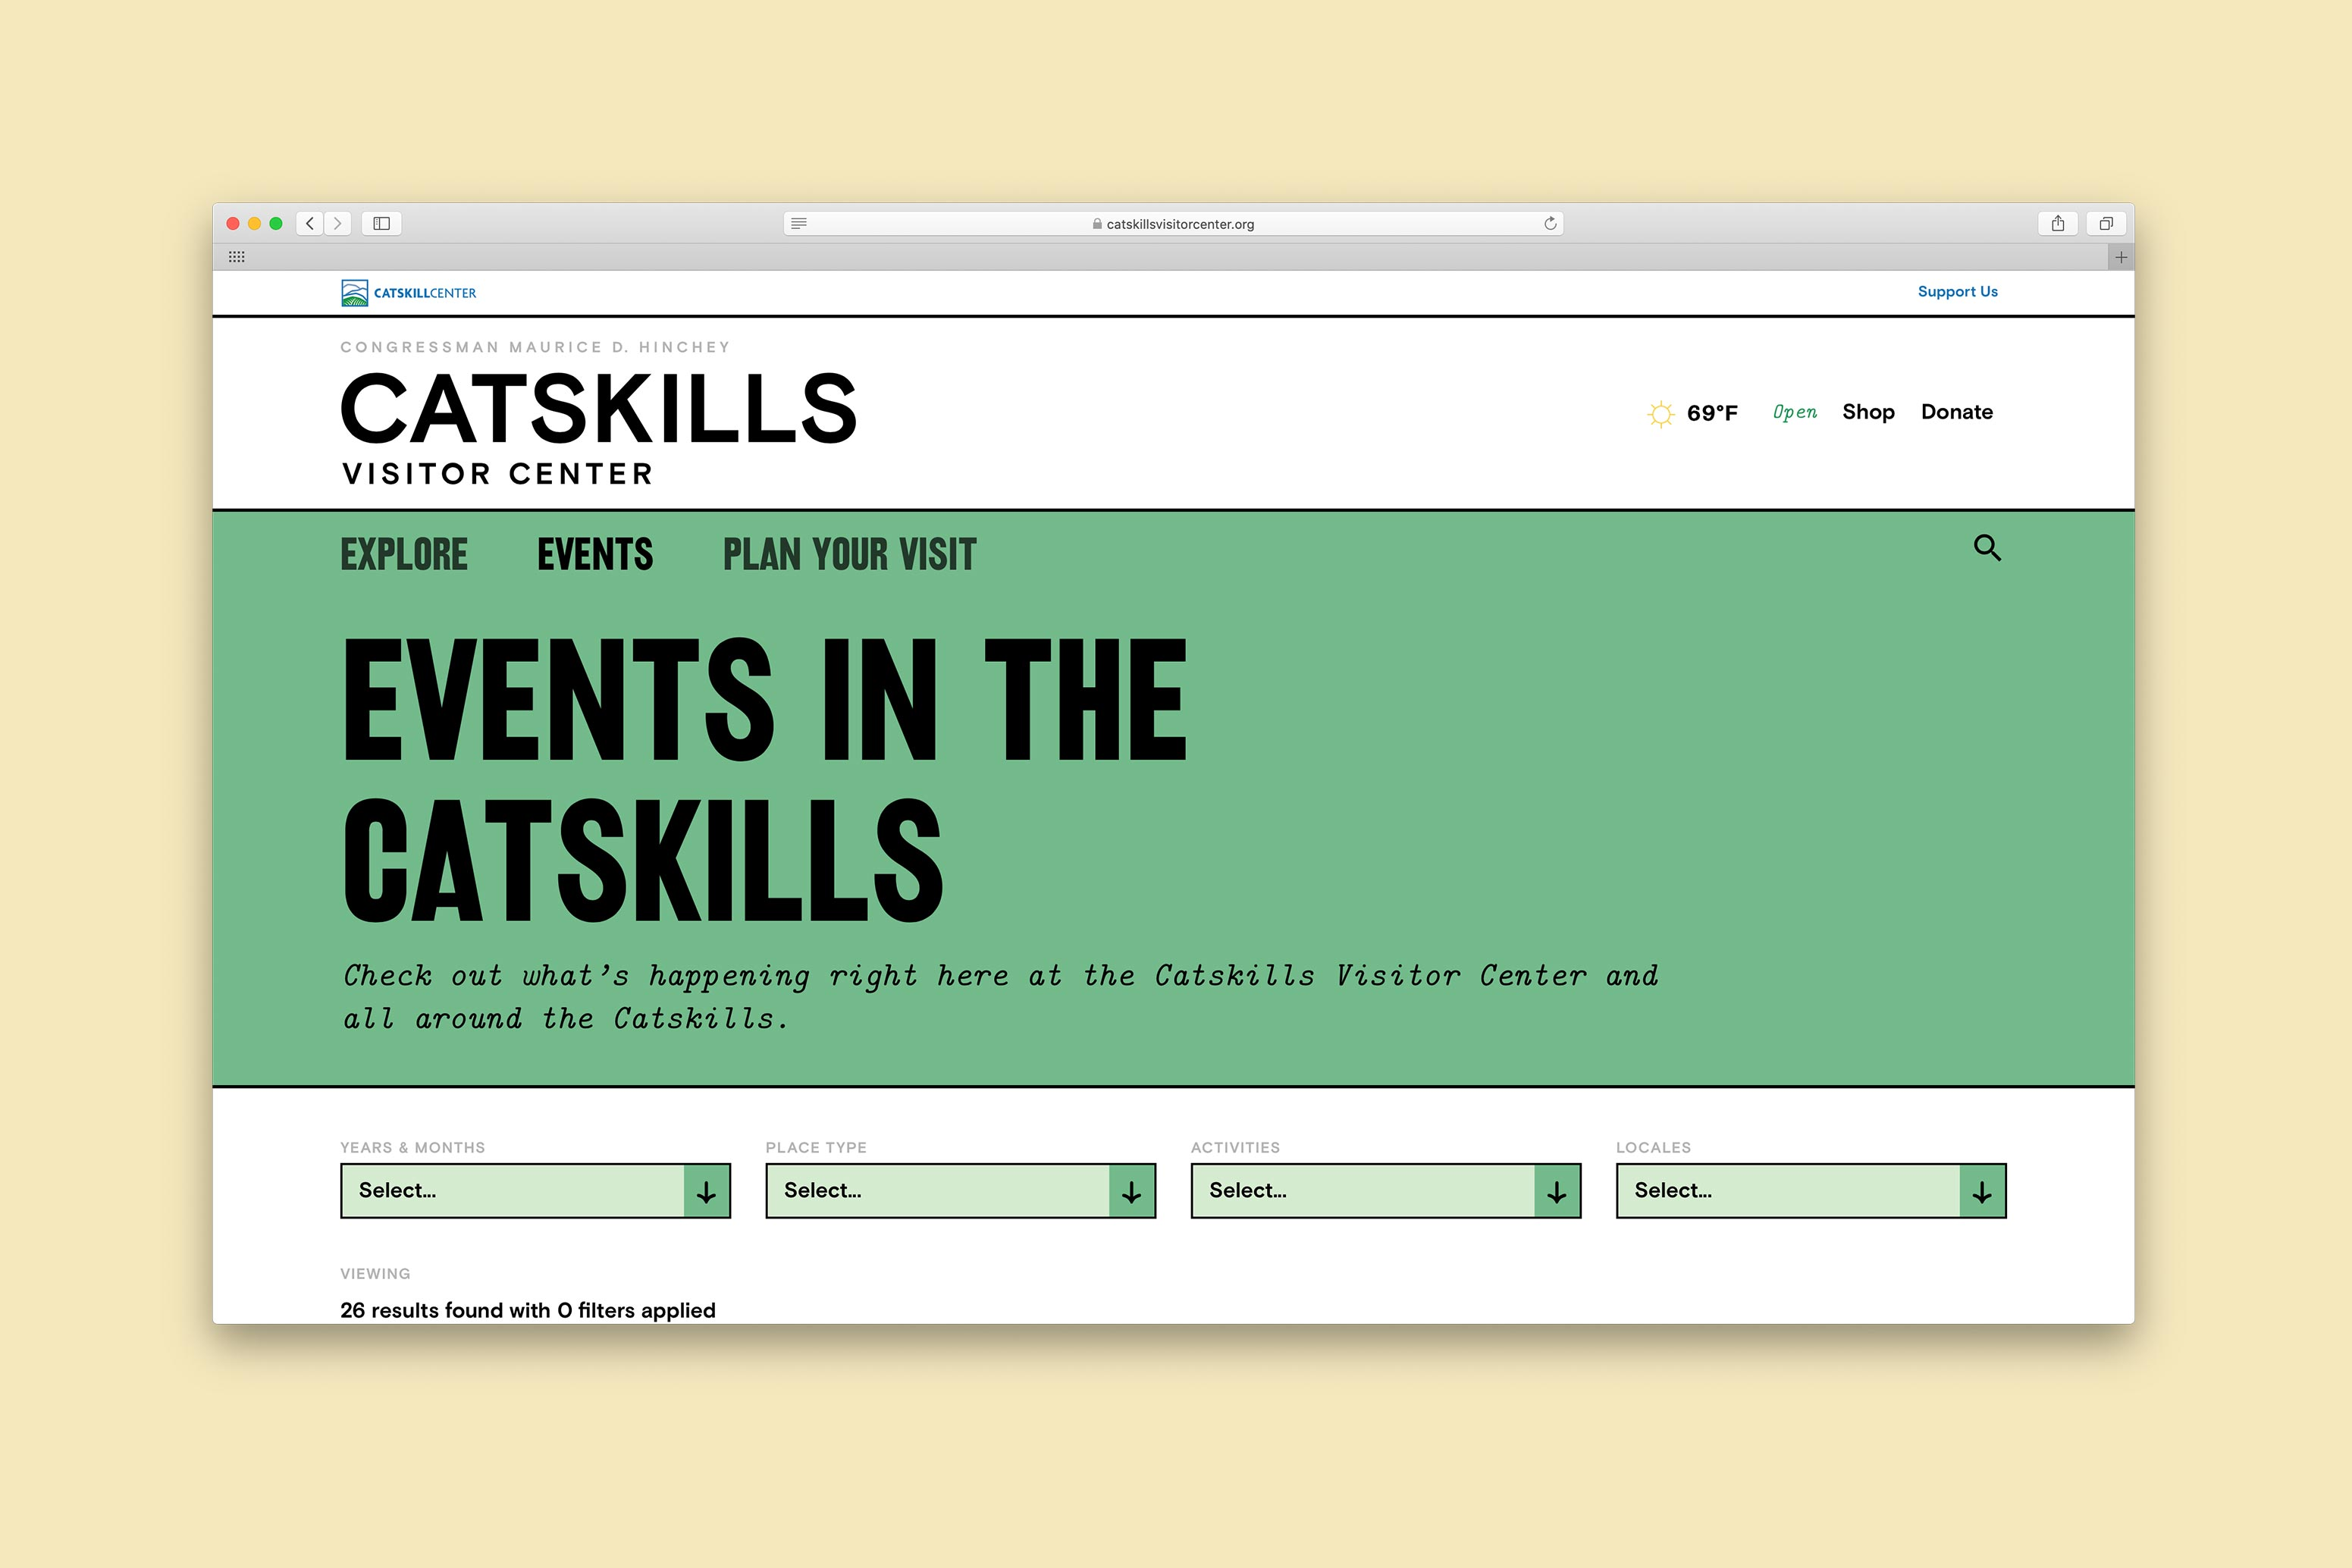 Catskills Website Events